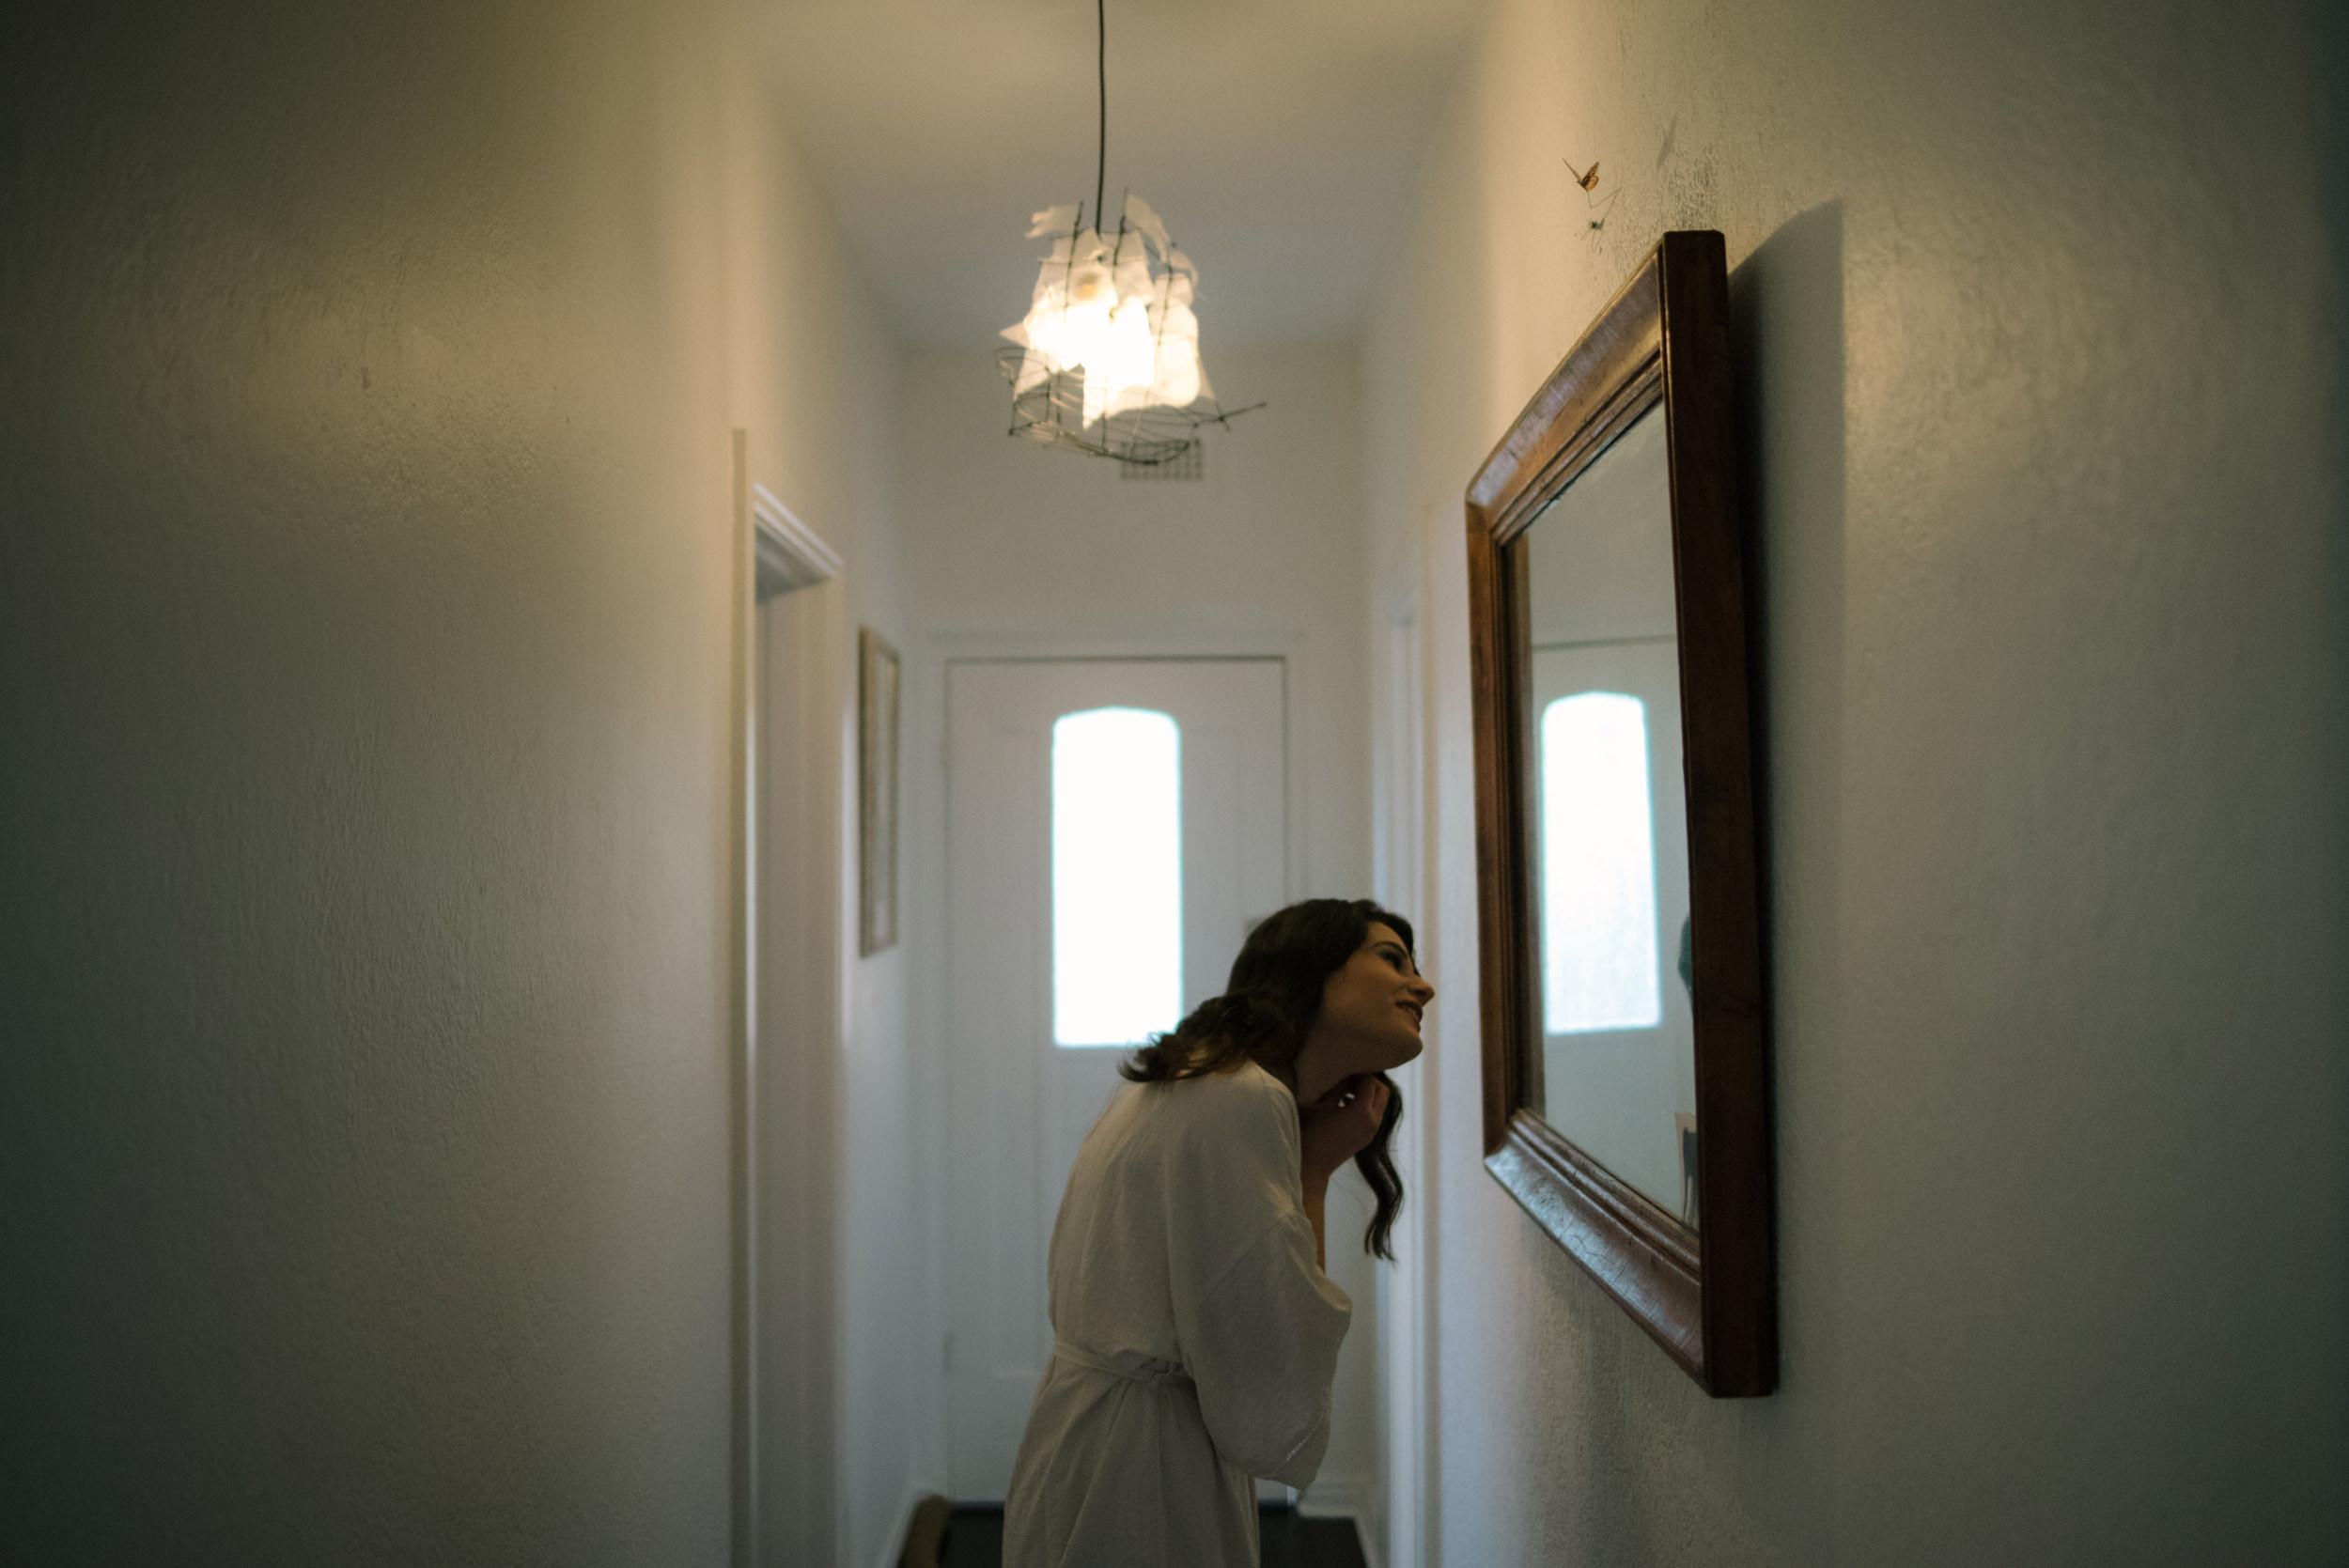 I-Got-You-Babe-&.Co.-Glasshaus-Wedding-Charlotte-Cameron0017.JPG